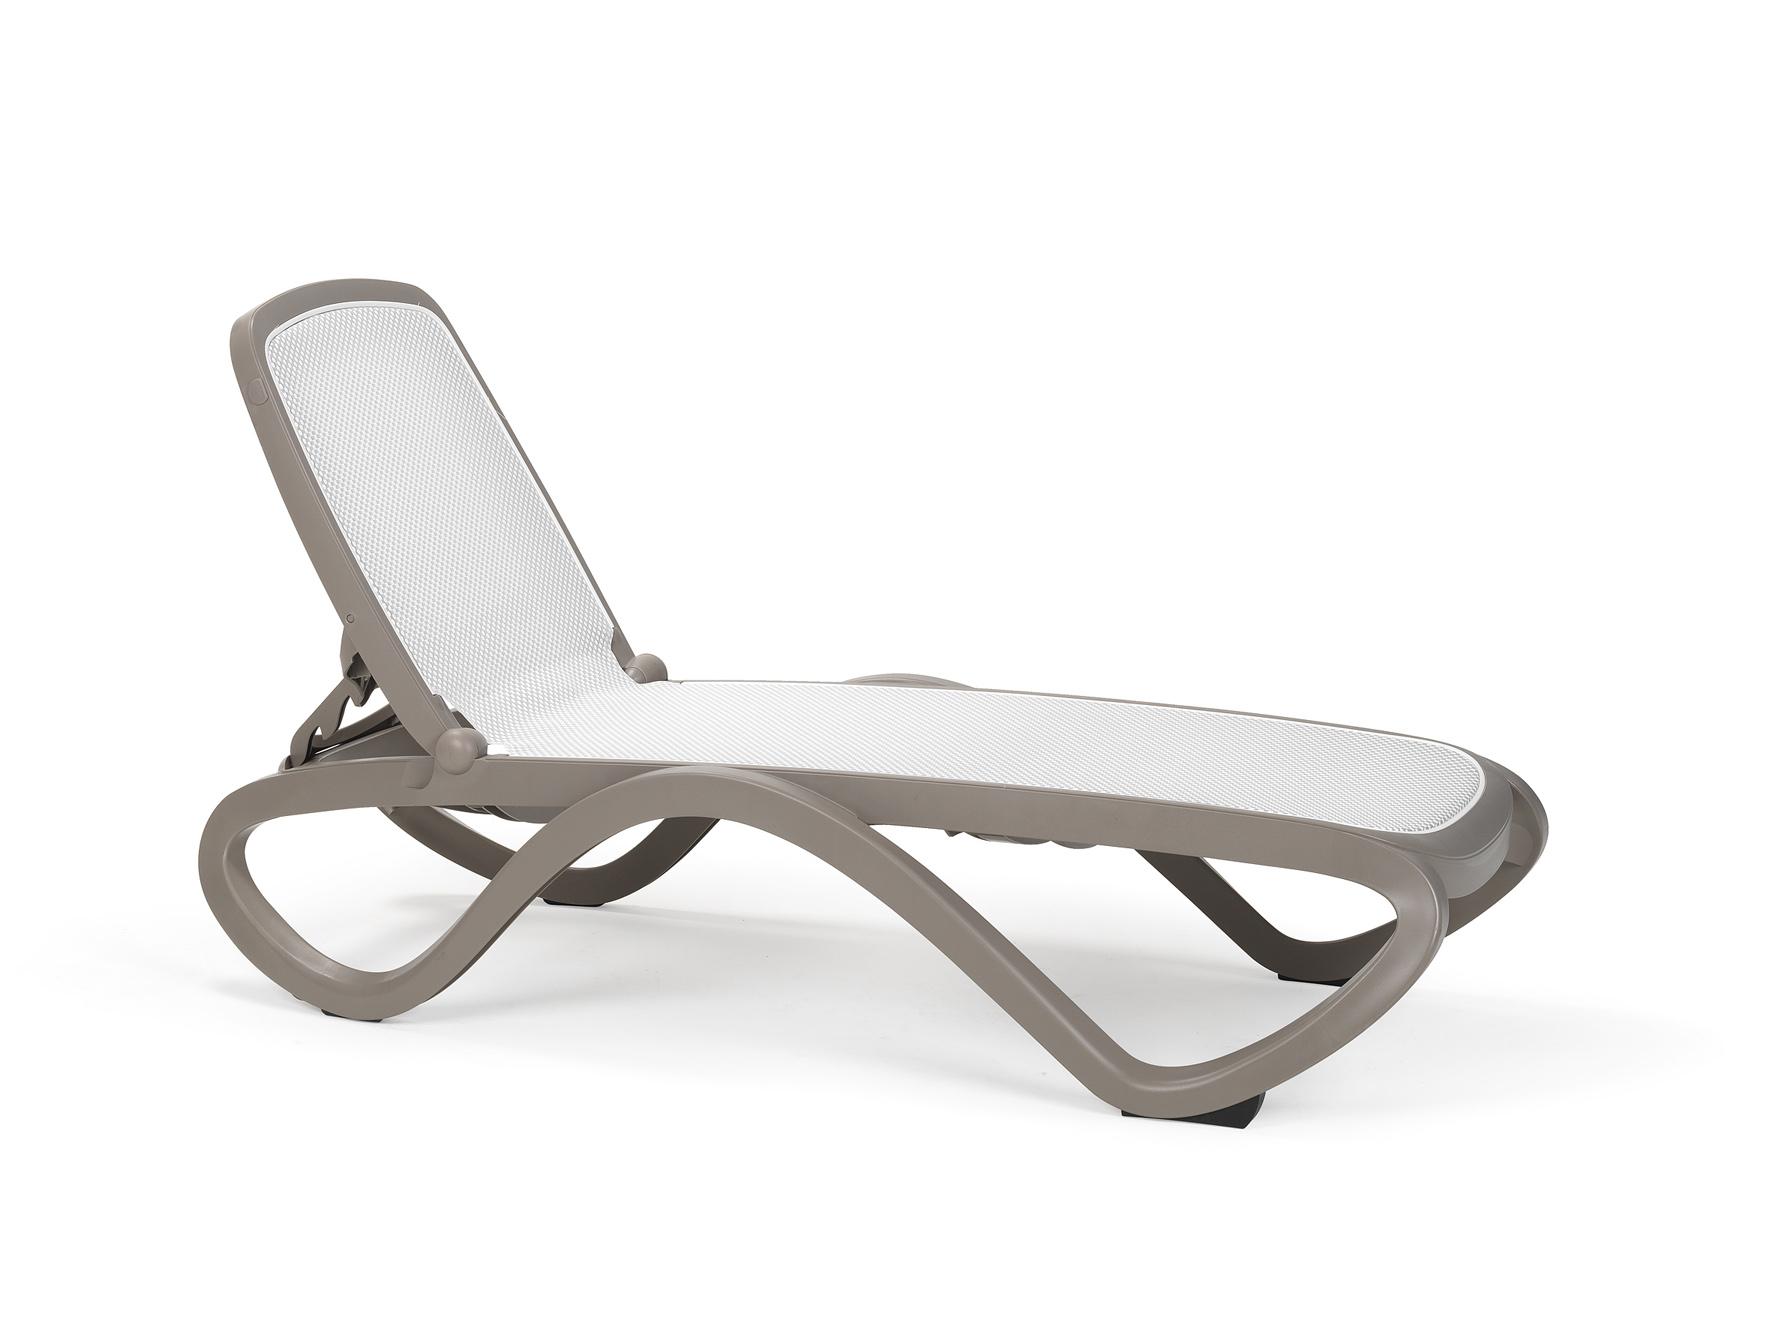 leżak basenowy Omega Nardi Trama